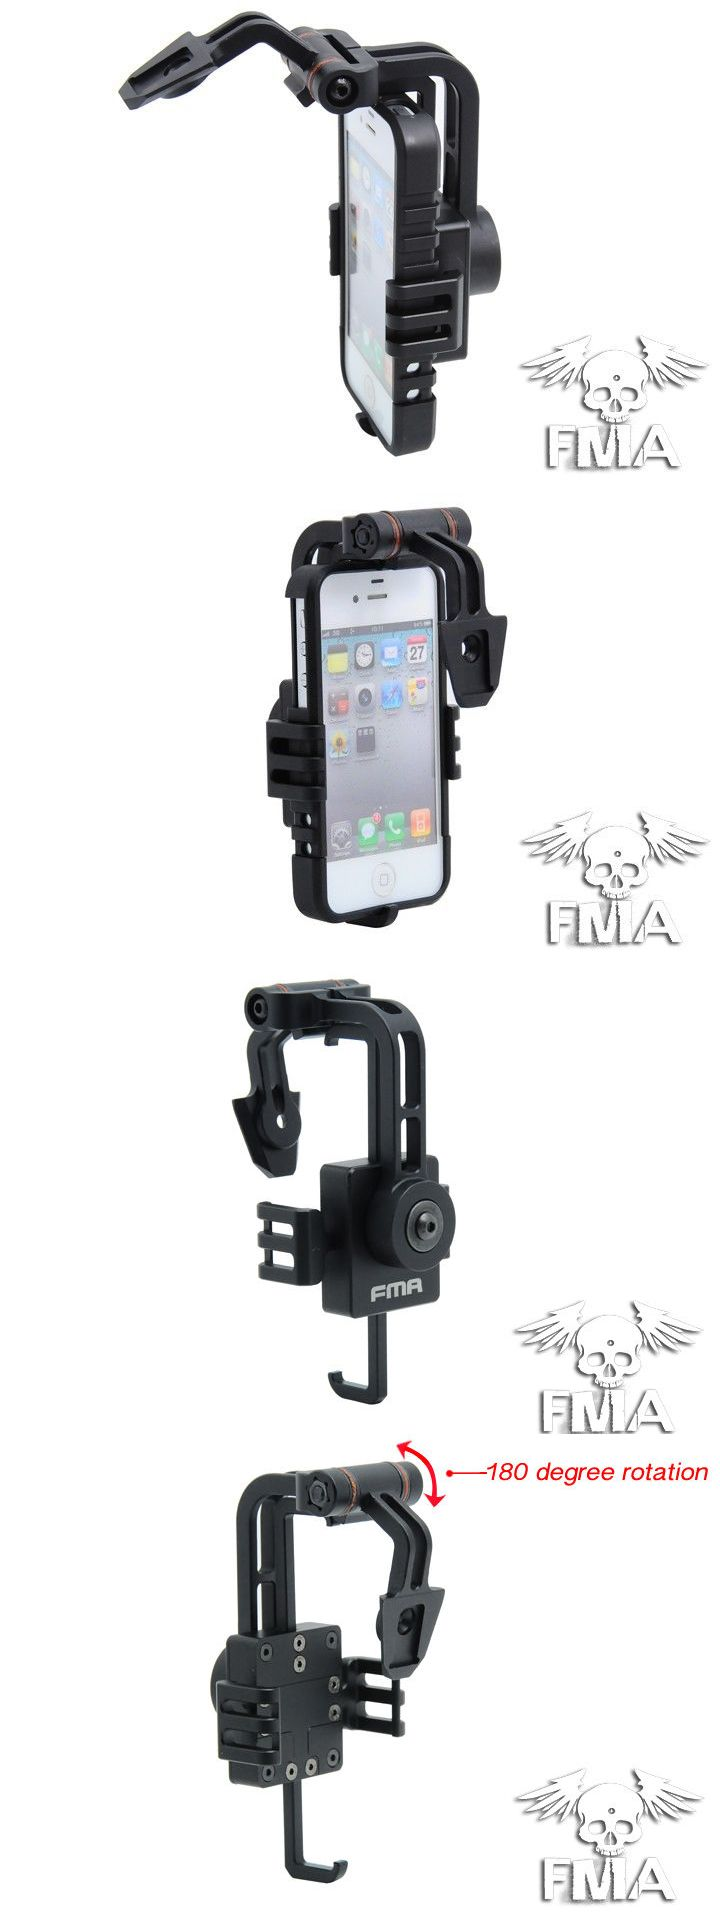 Helmet Accessories 177865: Fma Helmet Mount For Iphone 4 4S (Black) Tb642 -> BUY IT NOW ONLY: $76 on eBay!